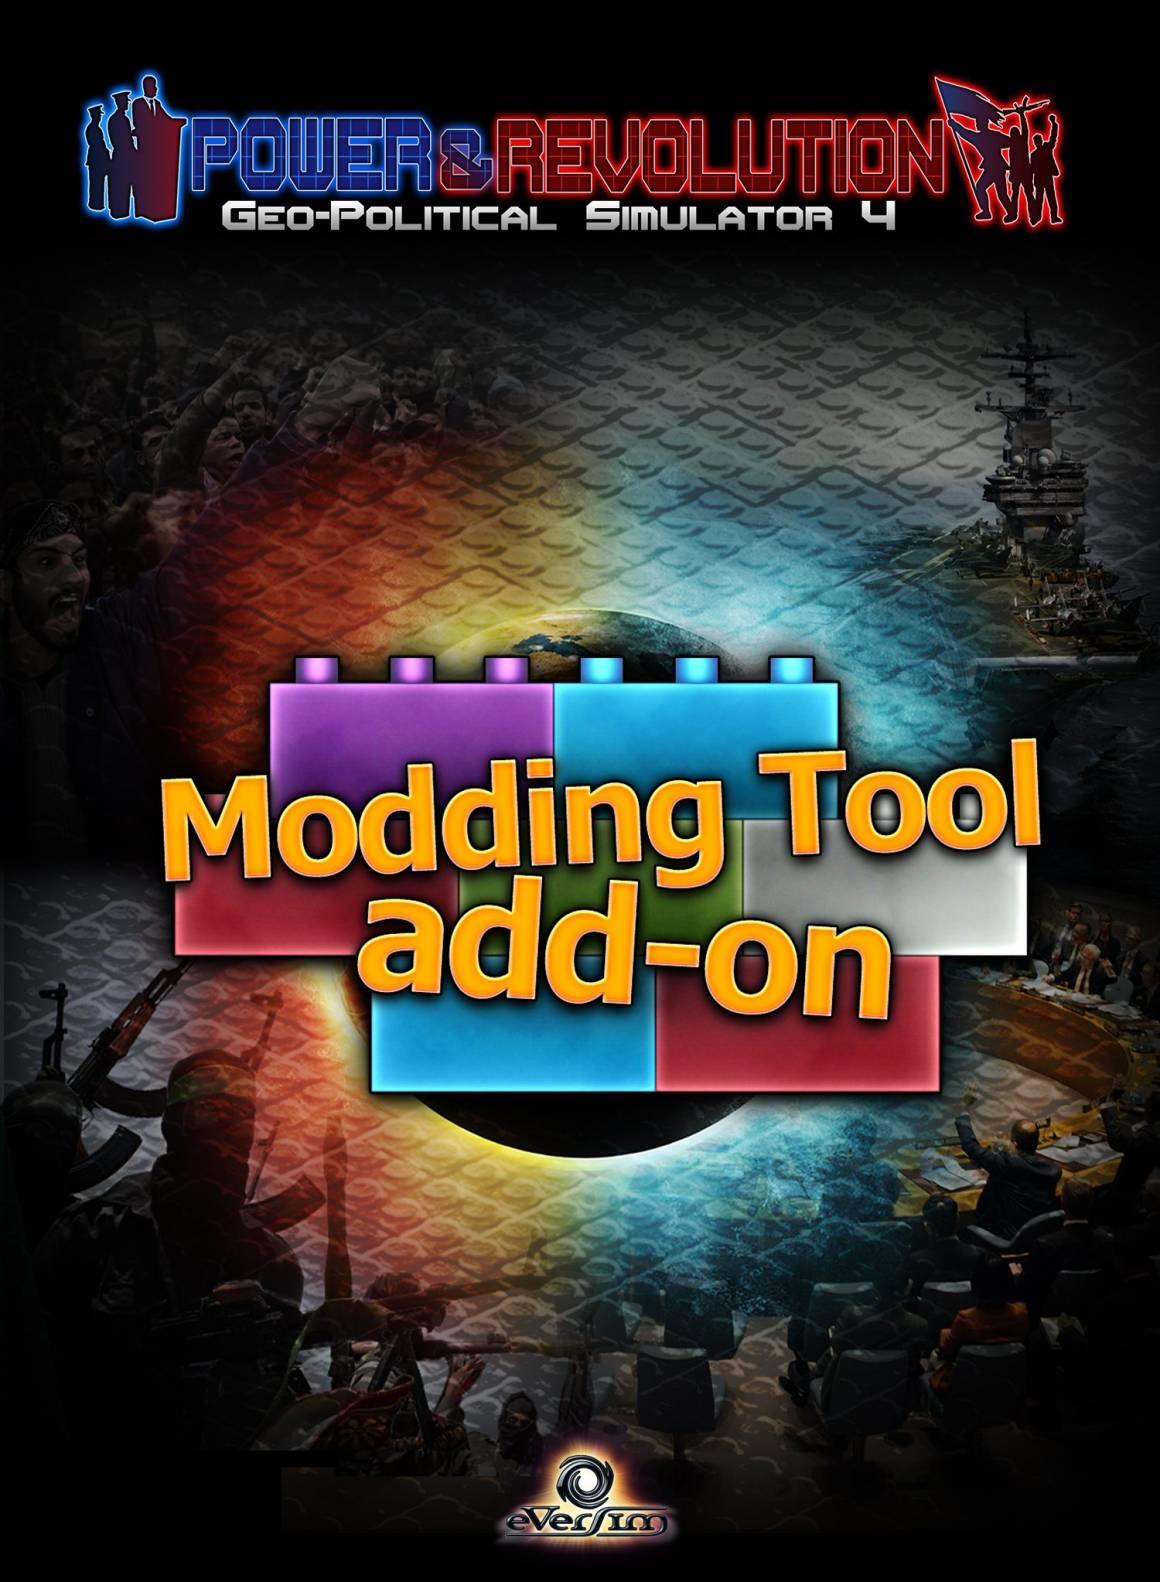 Modding Tool box illustration 1160x1582 - Disponibile l'add-on Modding Tool di Power & Revolution